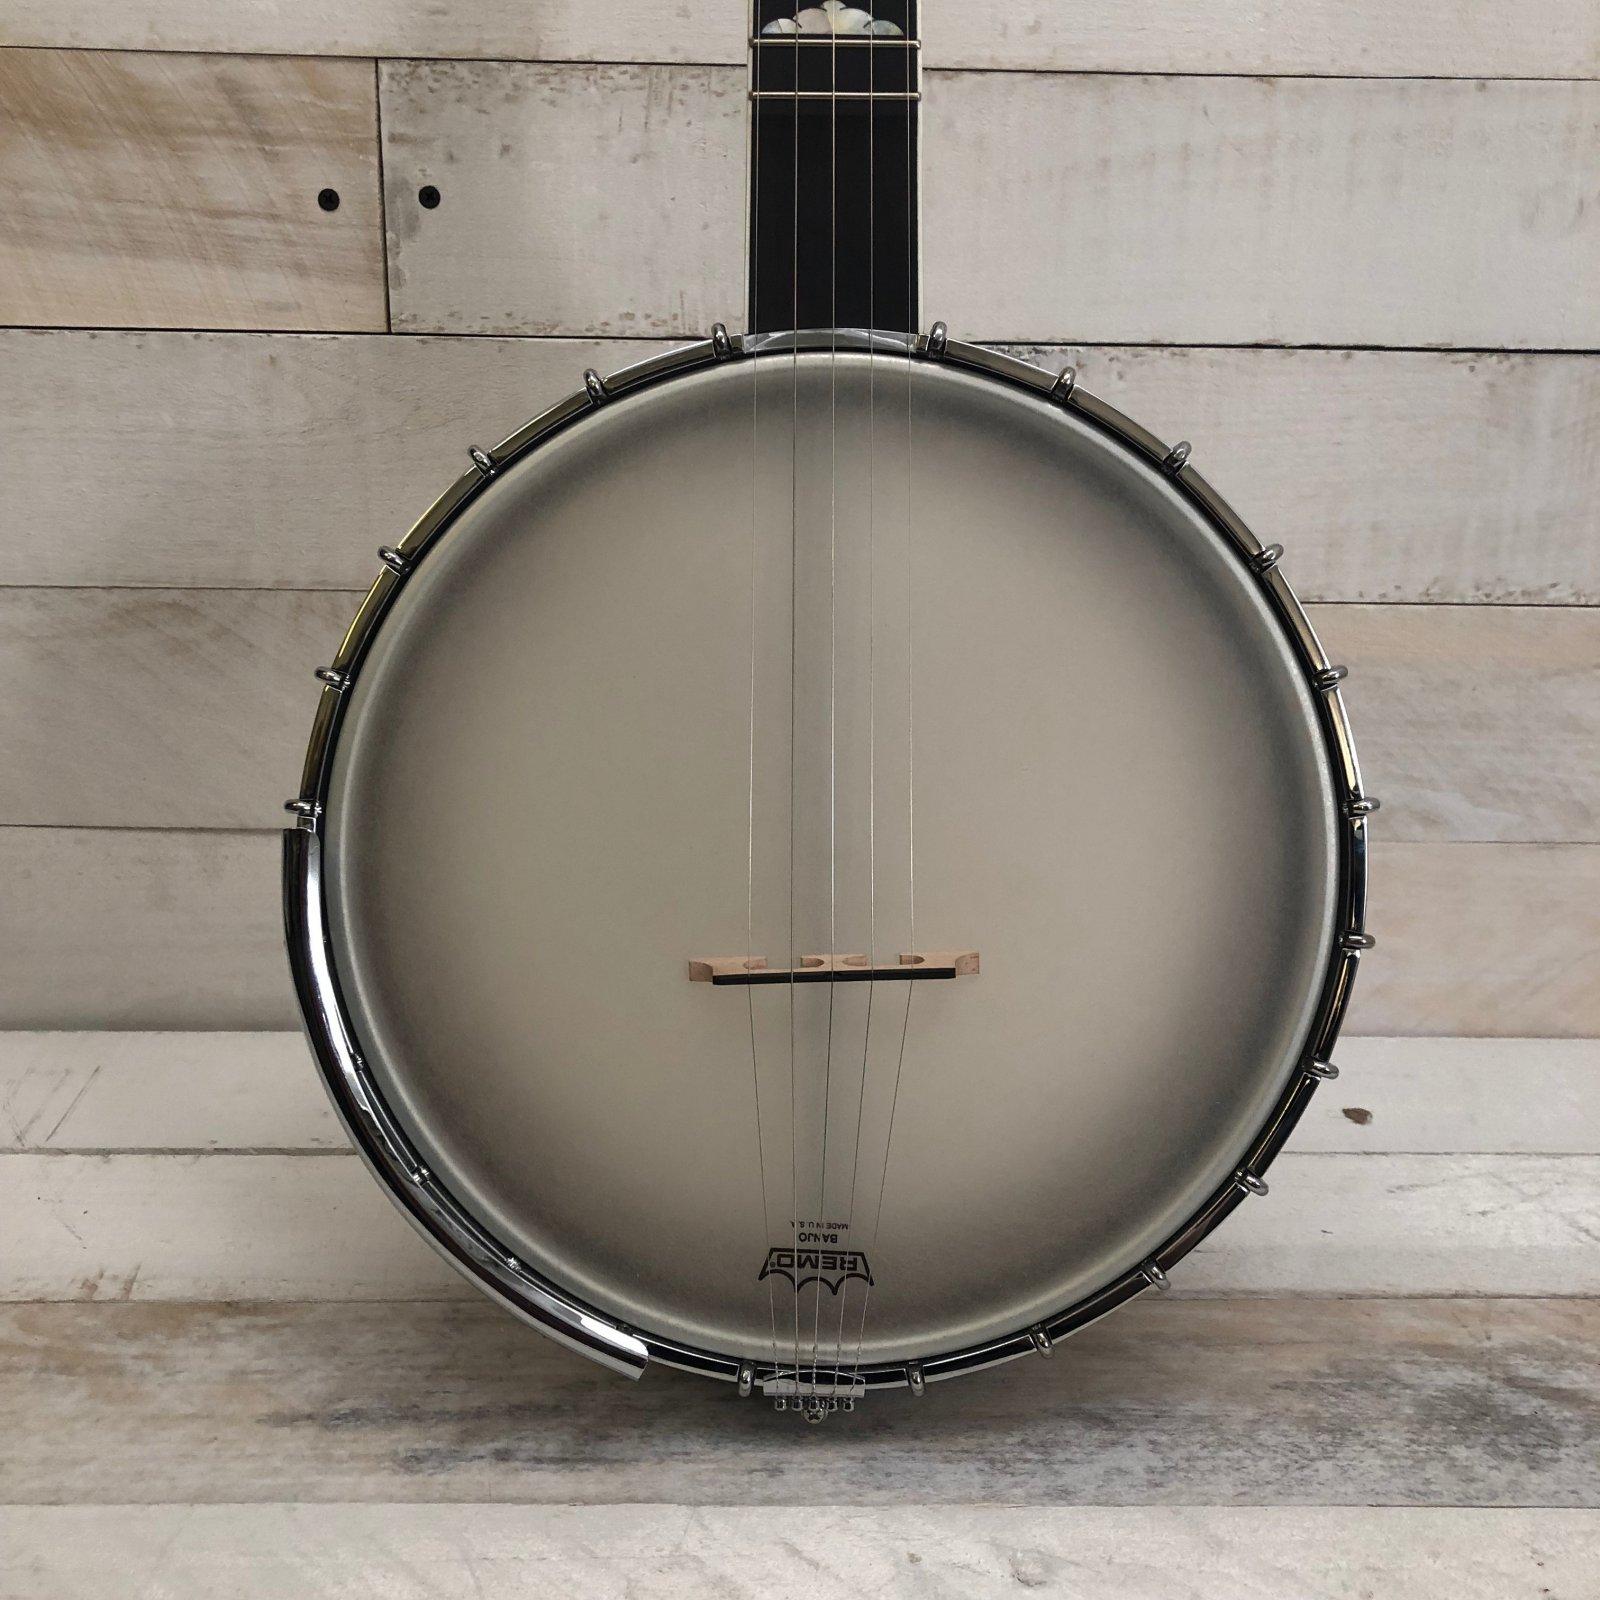 Gold Tone WL250 White Layde Open Back Banjo - 875116000110